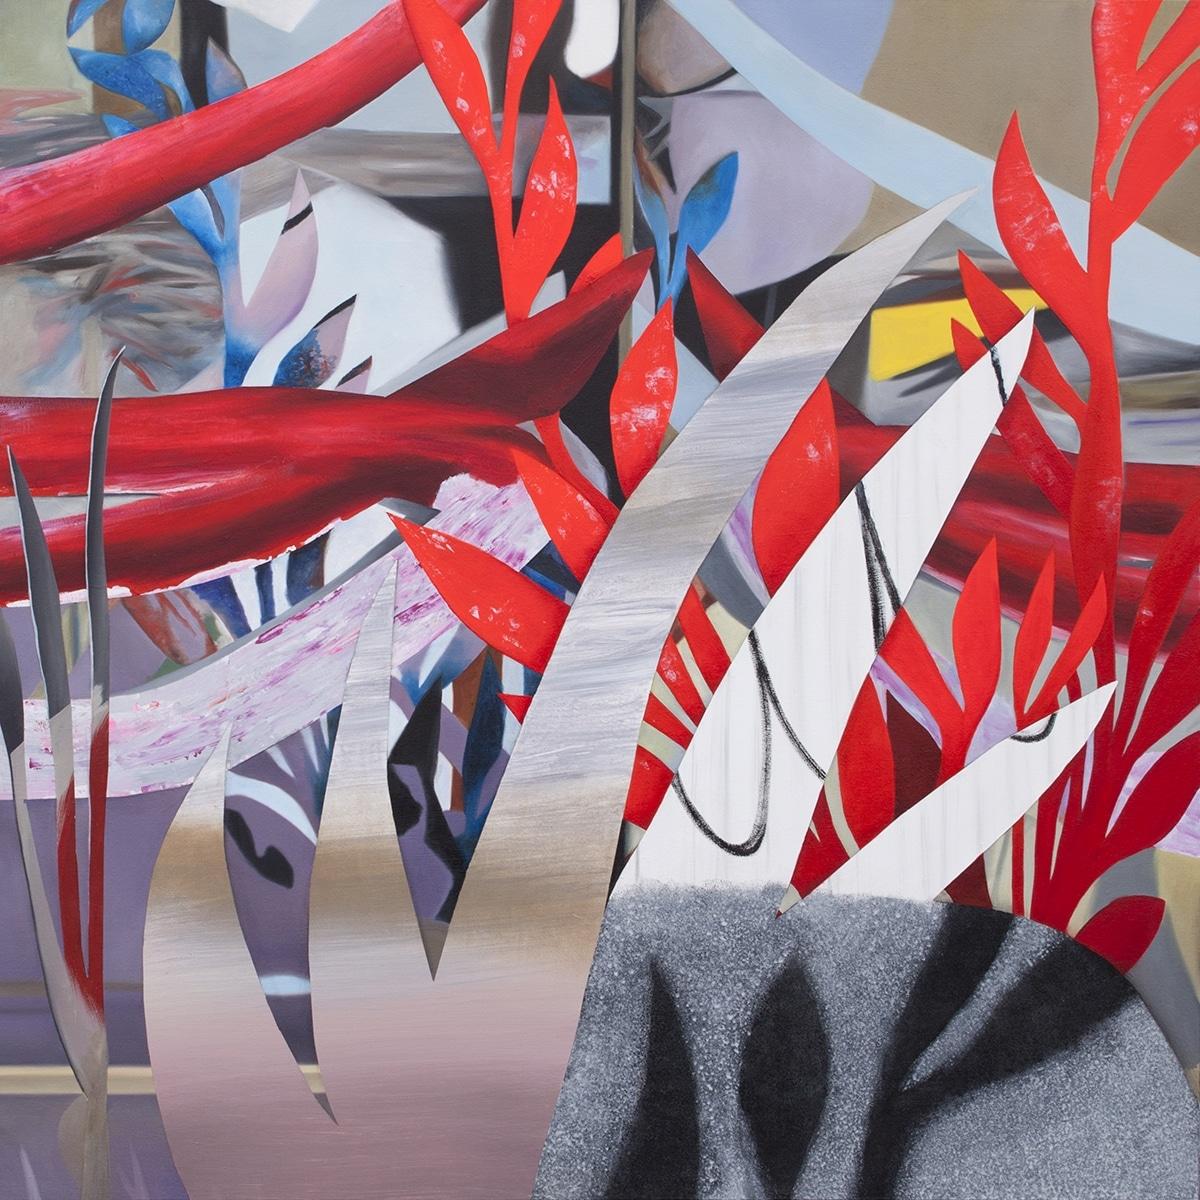 Fiona Ackerman, Red Snake, 2017, 101,5 x 101,5 cm, Öl und Acryl auf Leinwand